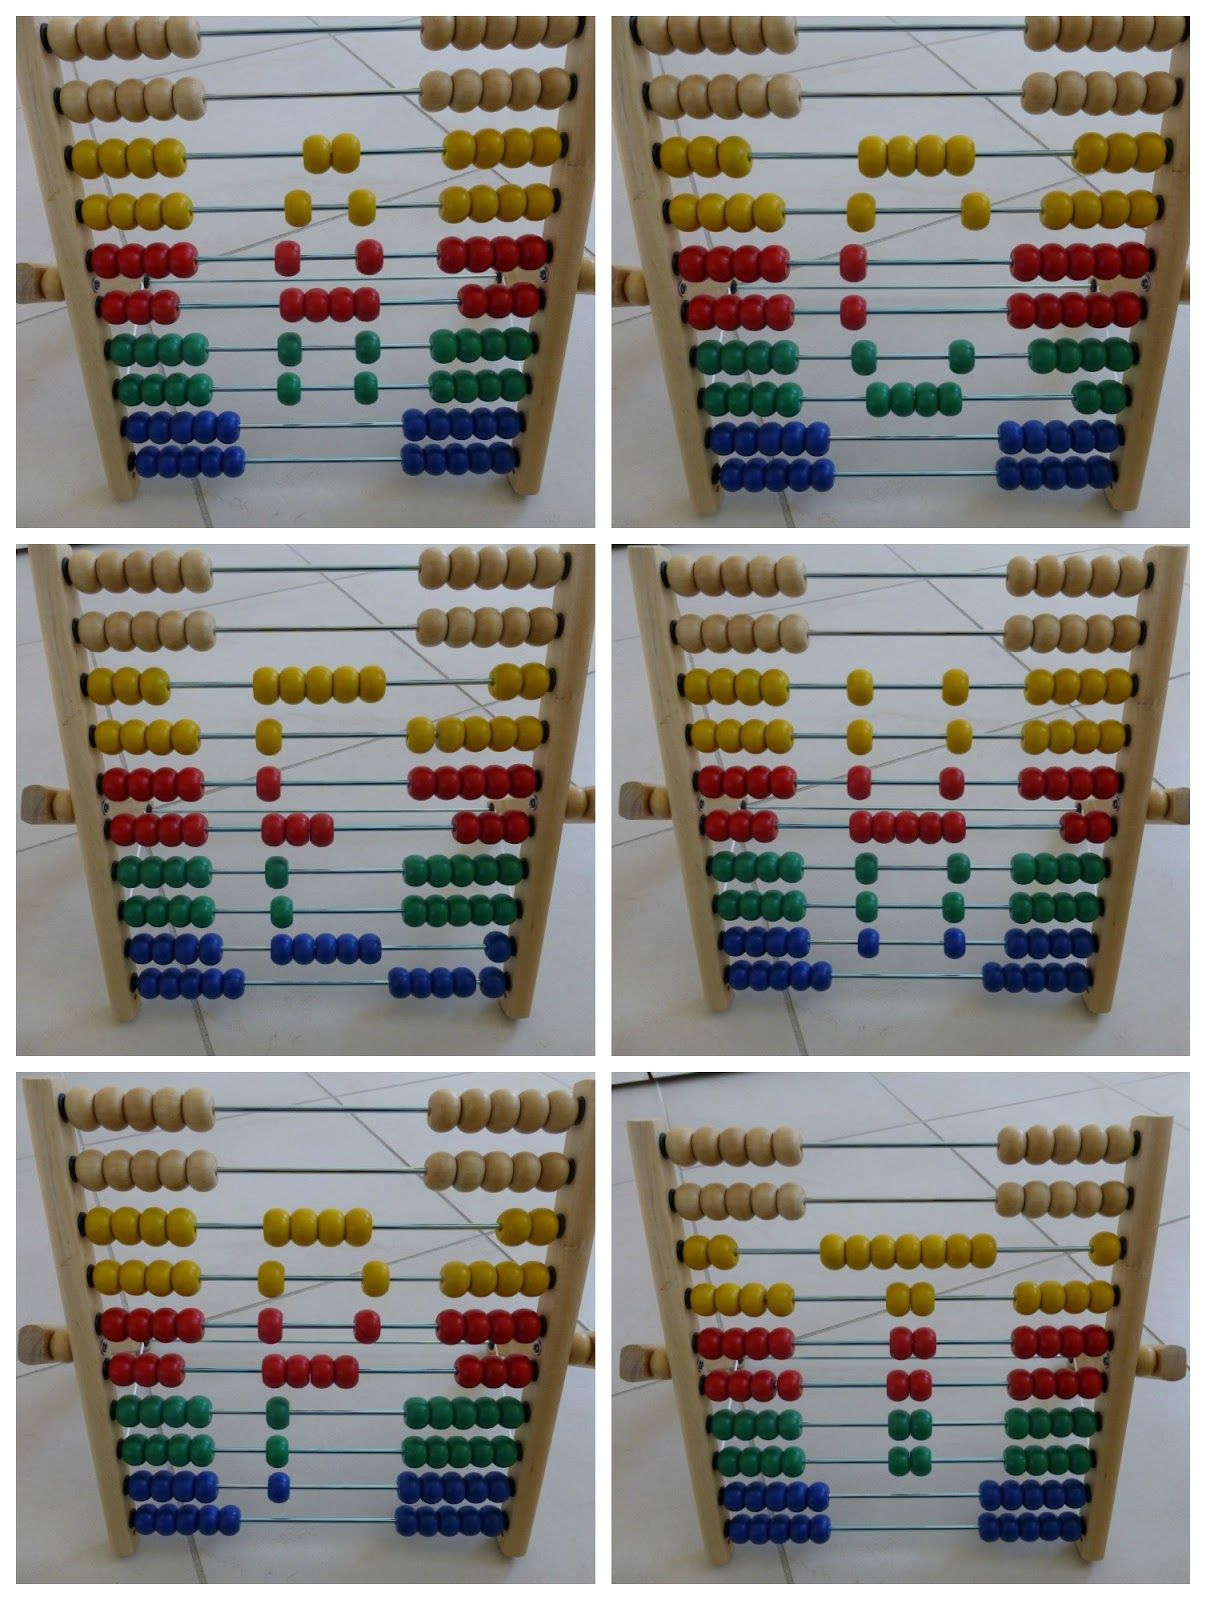 Pin By Bernadette Mom To 2 Posh Lil On Alphabet Activities For Kids Alphabet Activities Abacus Math Alphabet Preschool [ 1600 x 1206 Pixel ]